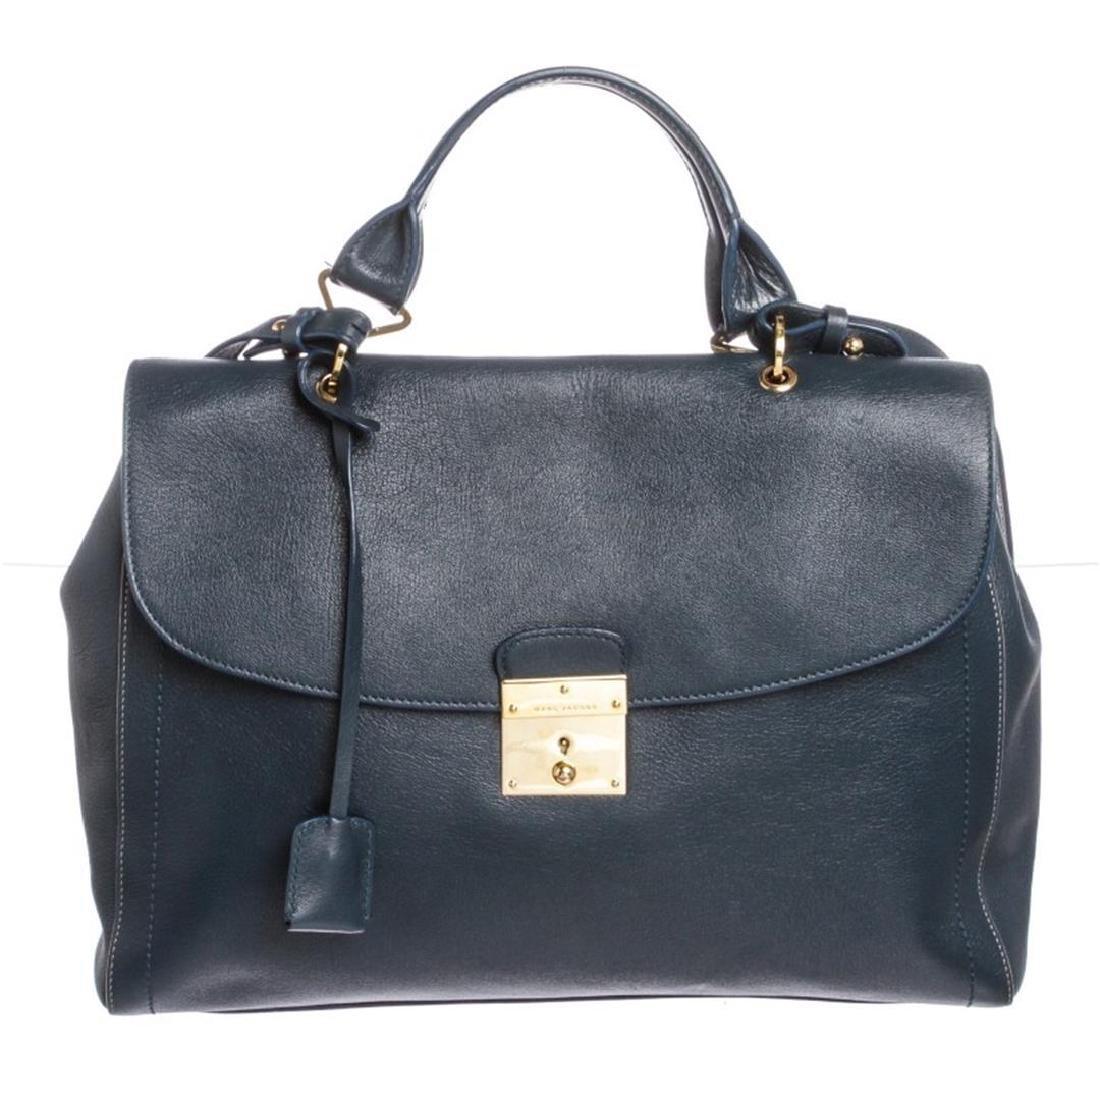 Marc Jacobs Blue Leather Flap Satchel Handbag